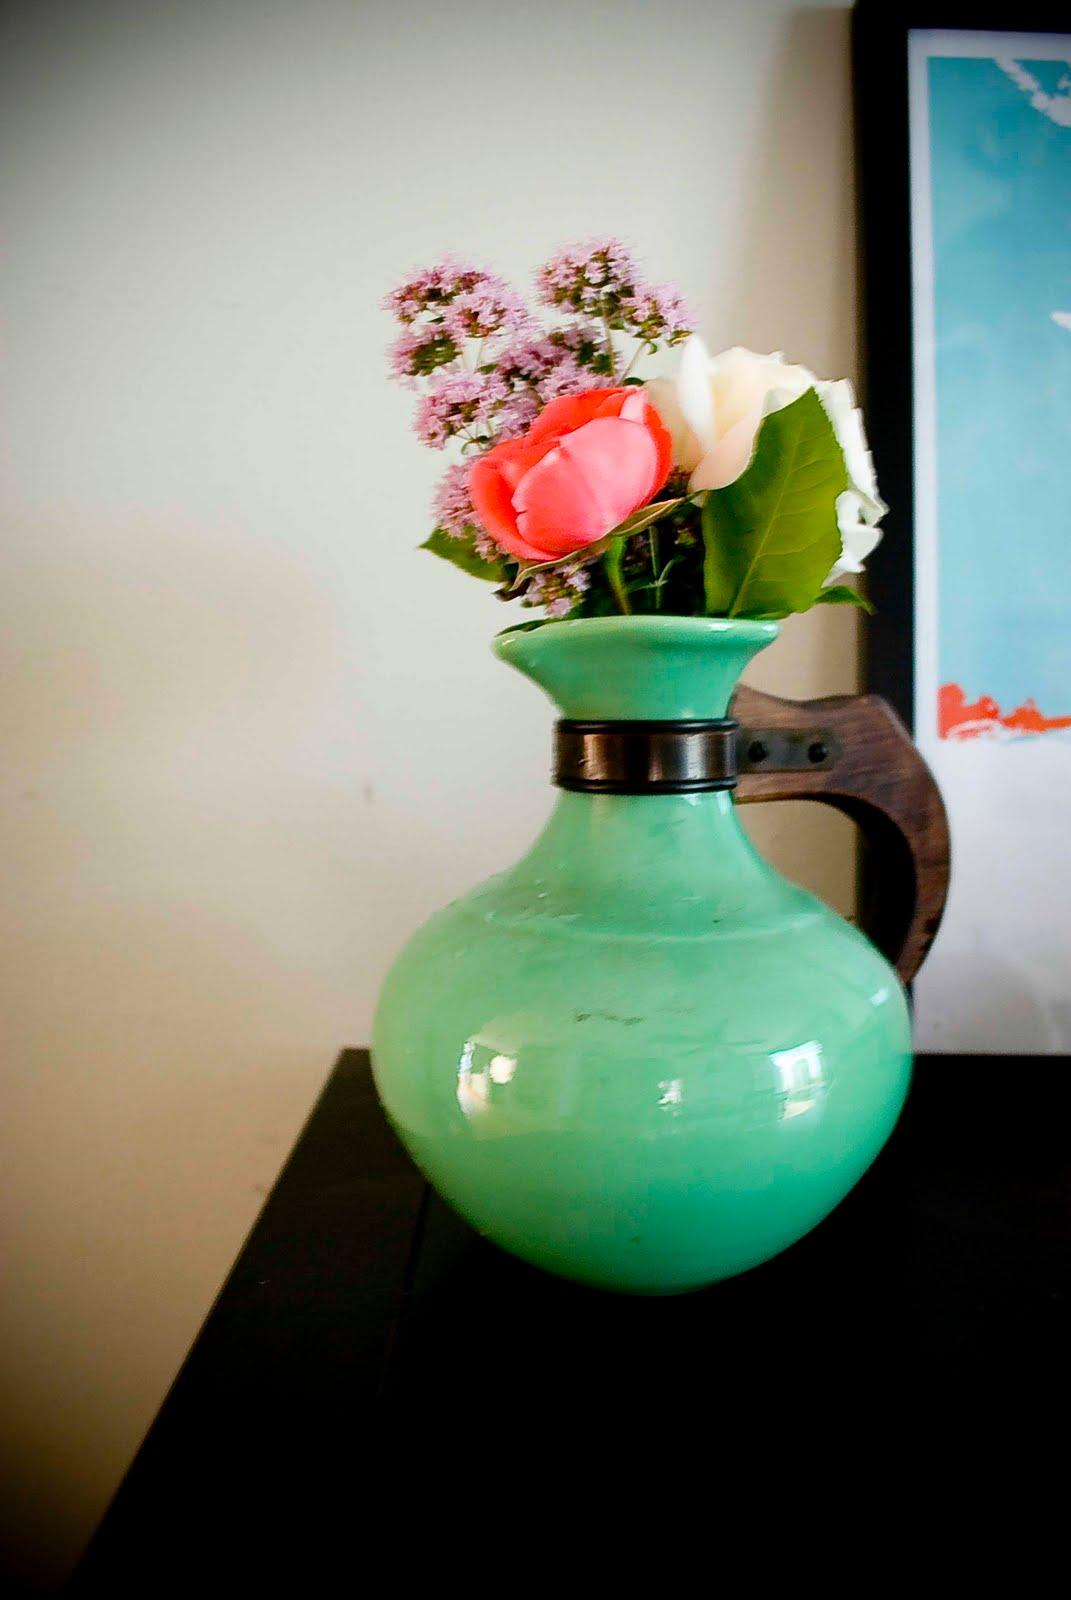 http://3.bp.blogspot.com/_OhIBR7-KiGc/TEDSKfhzGRI/AAAAAAAAARE/64-iT3c7KBI/s1600/Flowers3.jpg